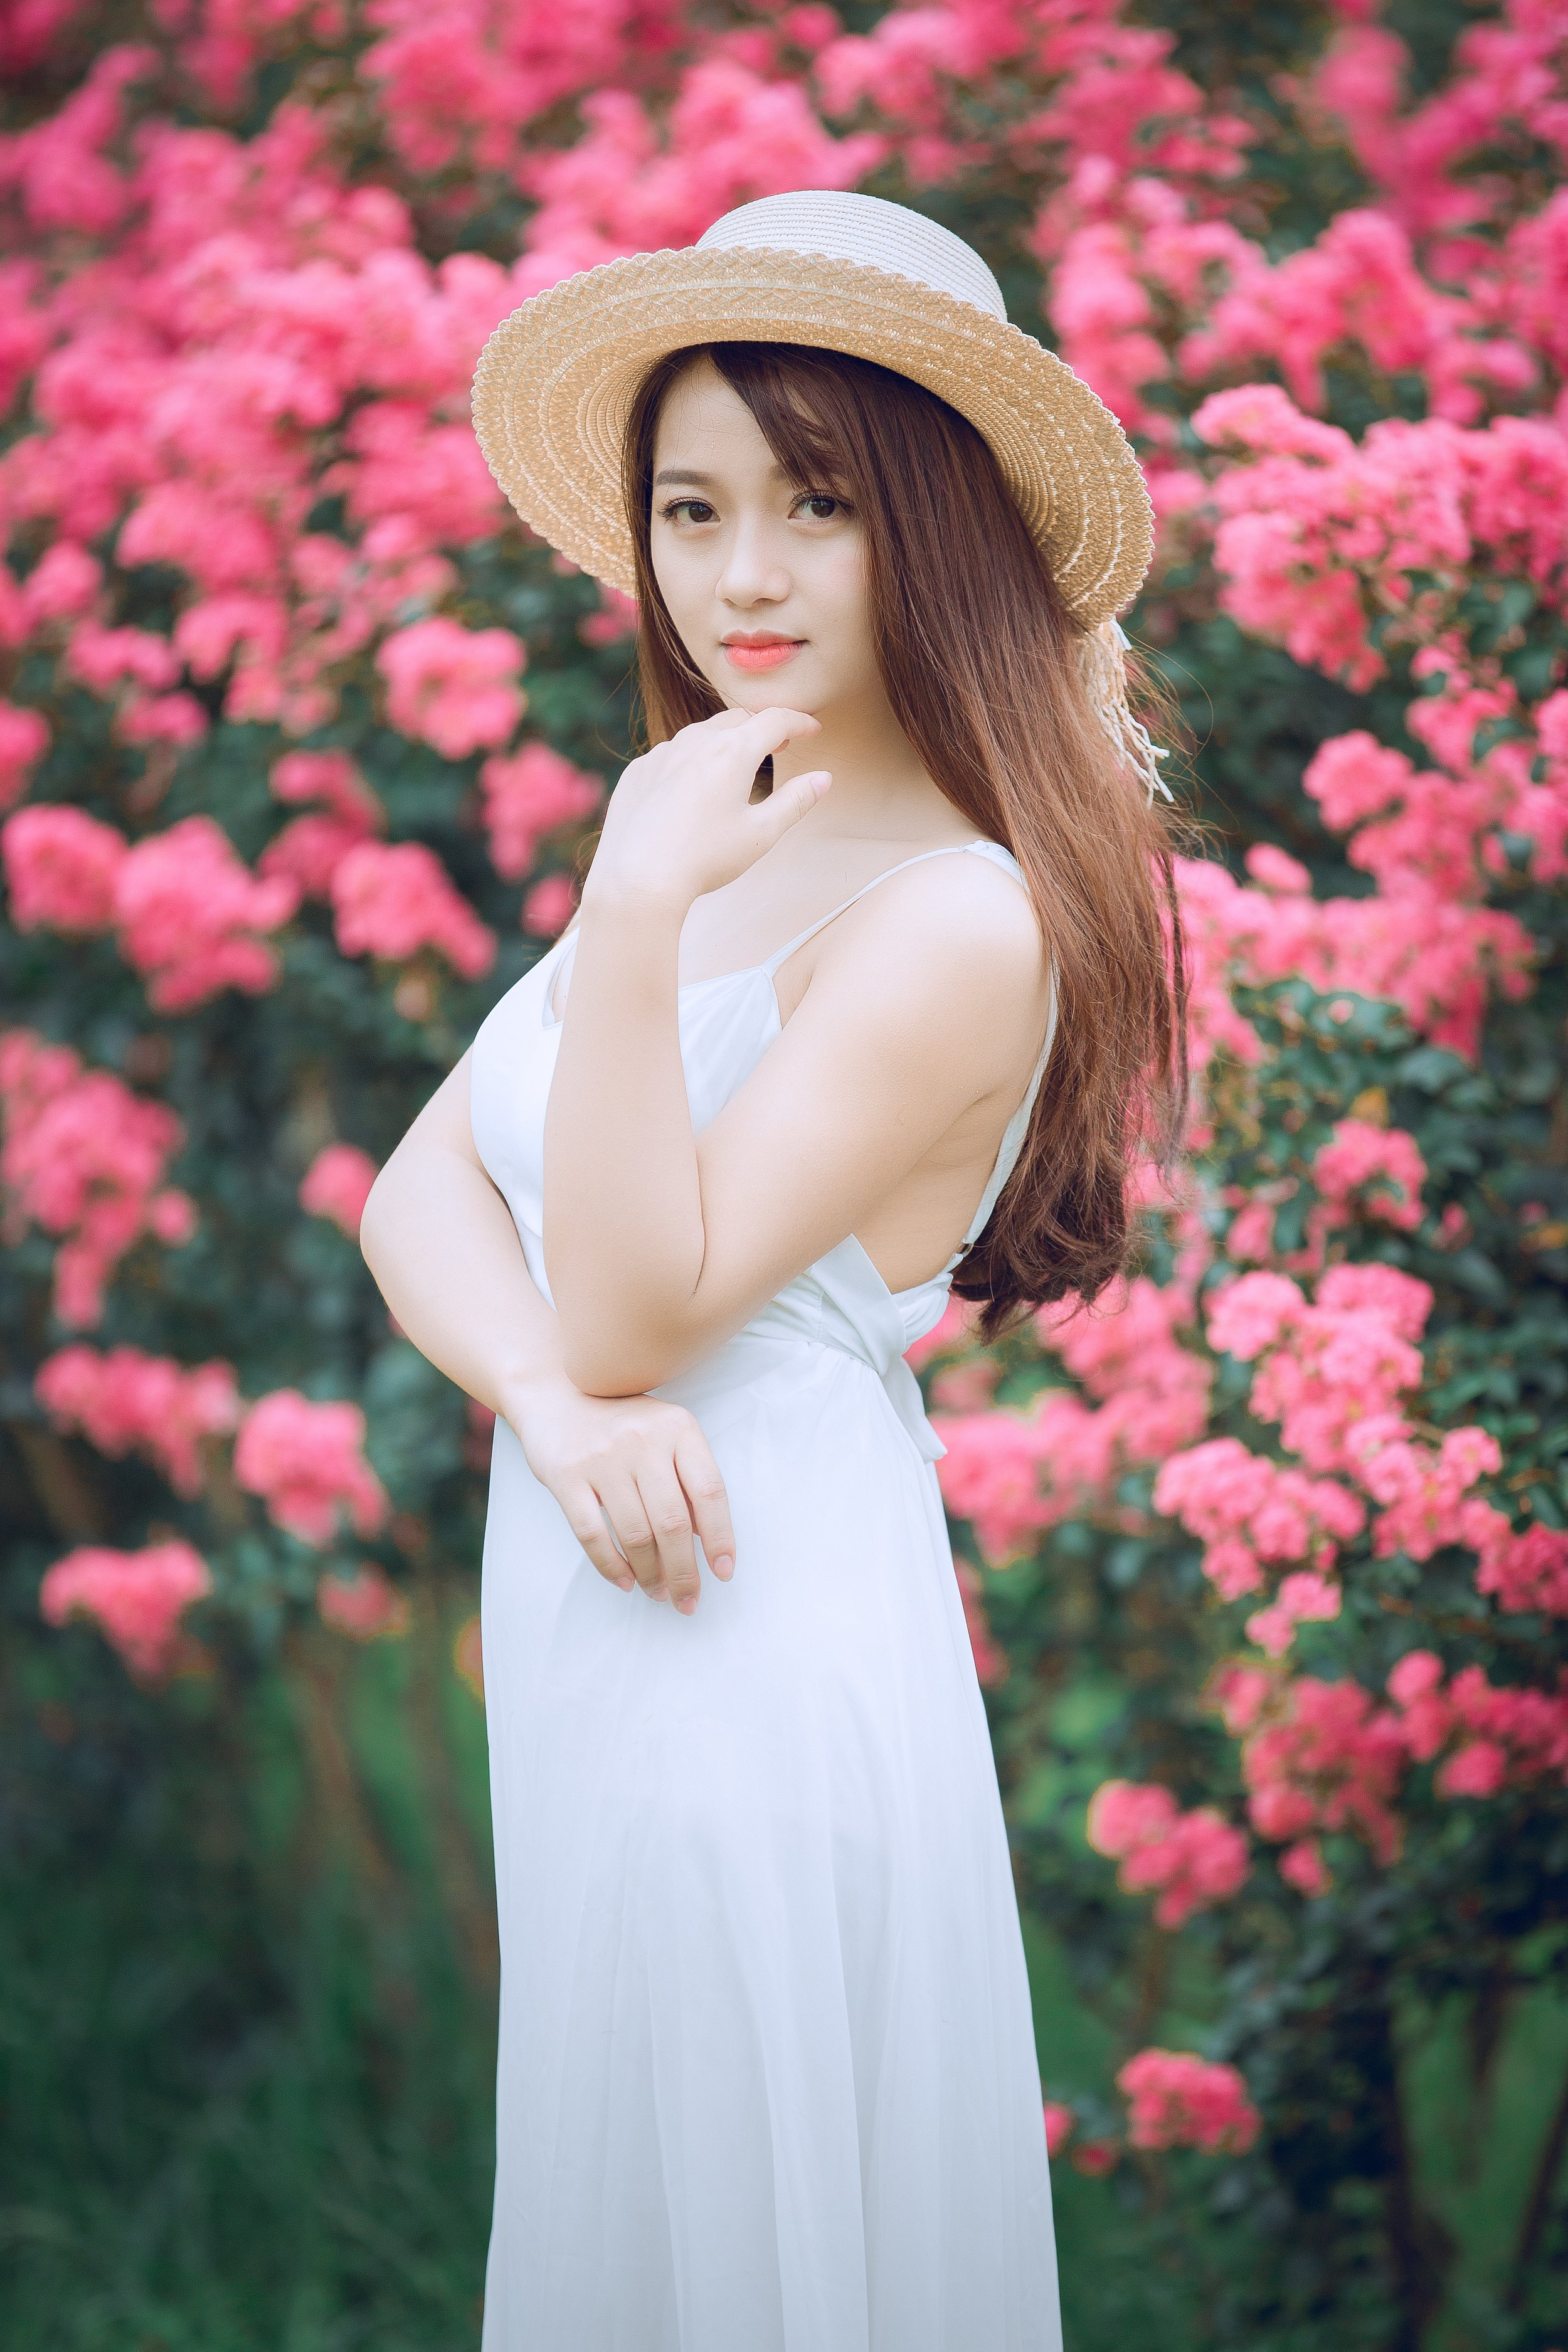 beautiful-bloom-blossom-1406765.jpg